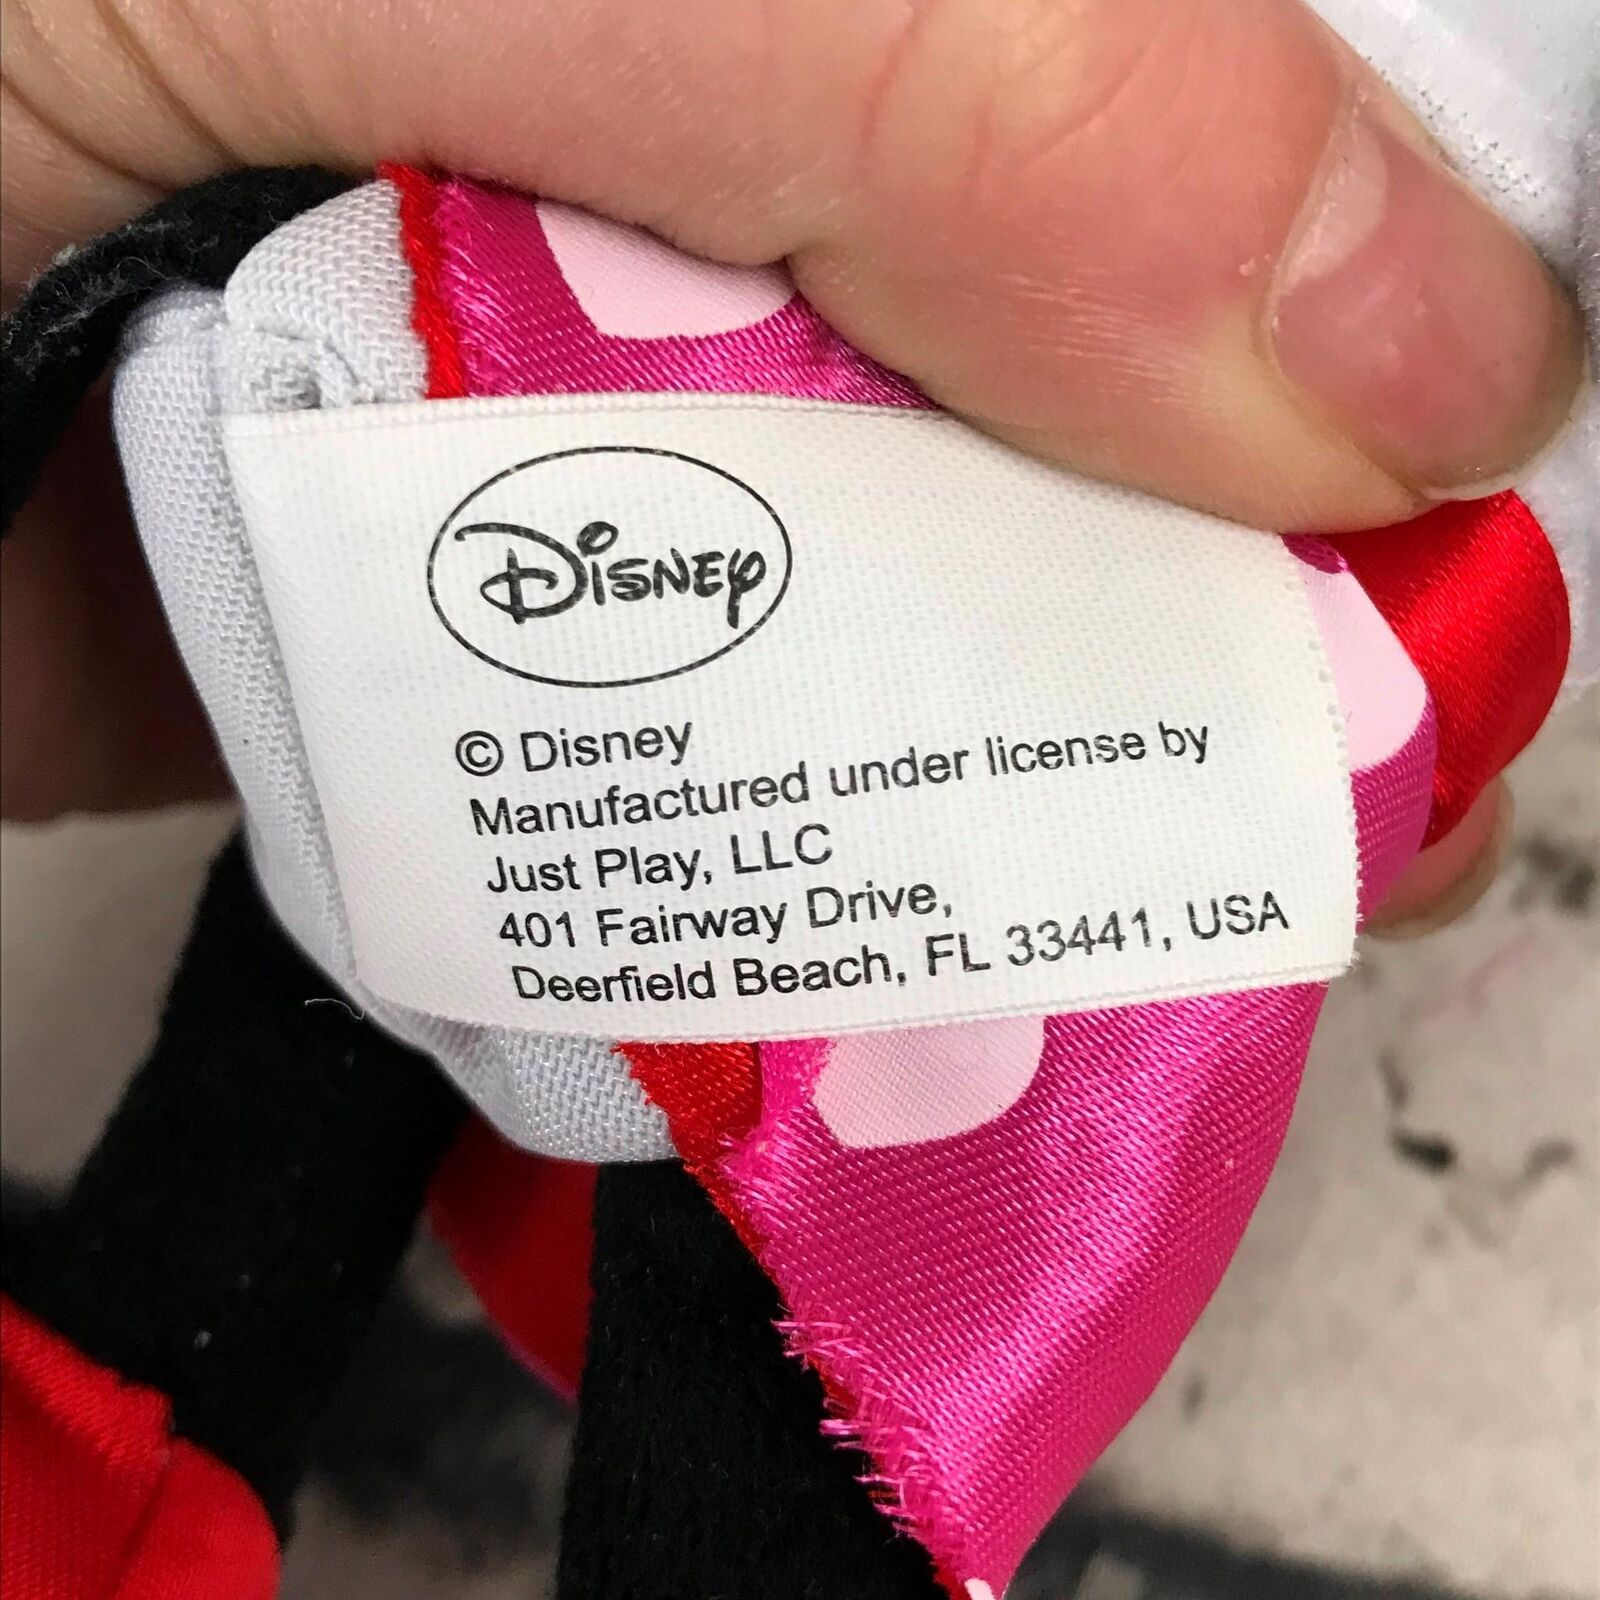 Disney Minnie Mouse Plush Doll Pink Polka Dot Heart Stuffed Animal Soft Toy